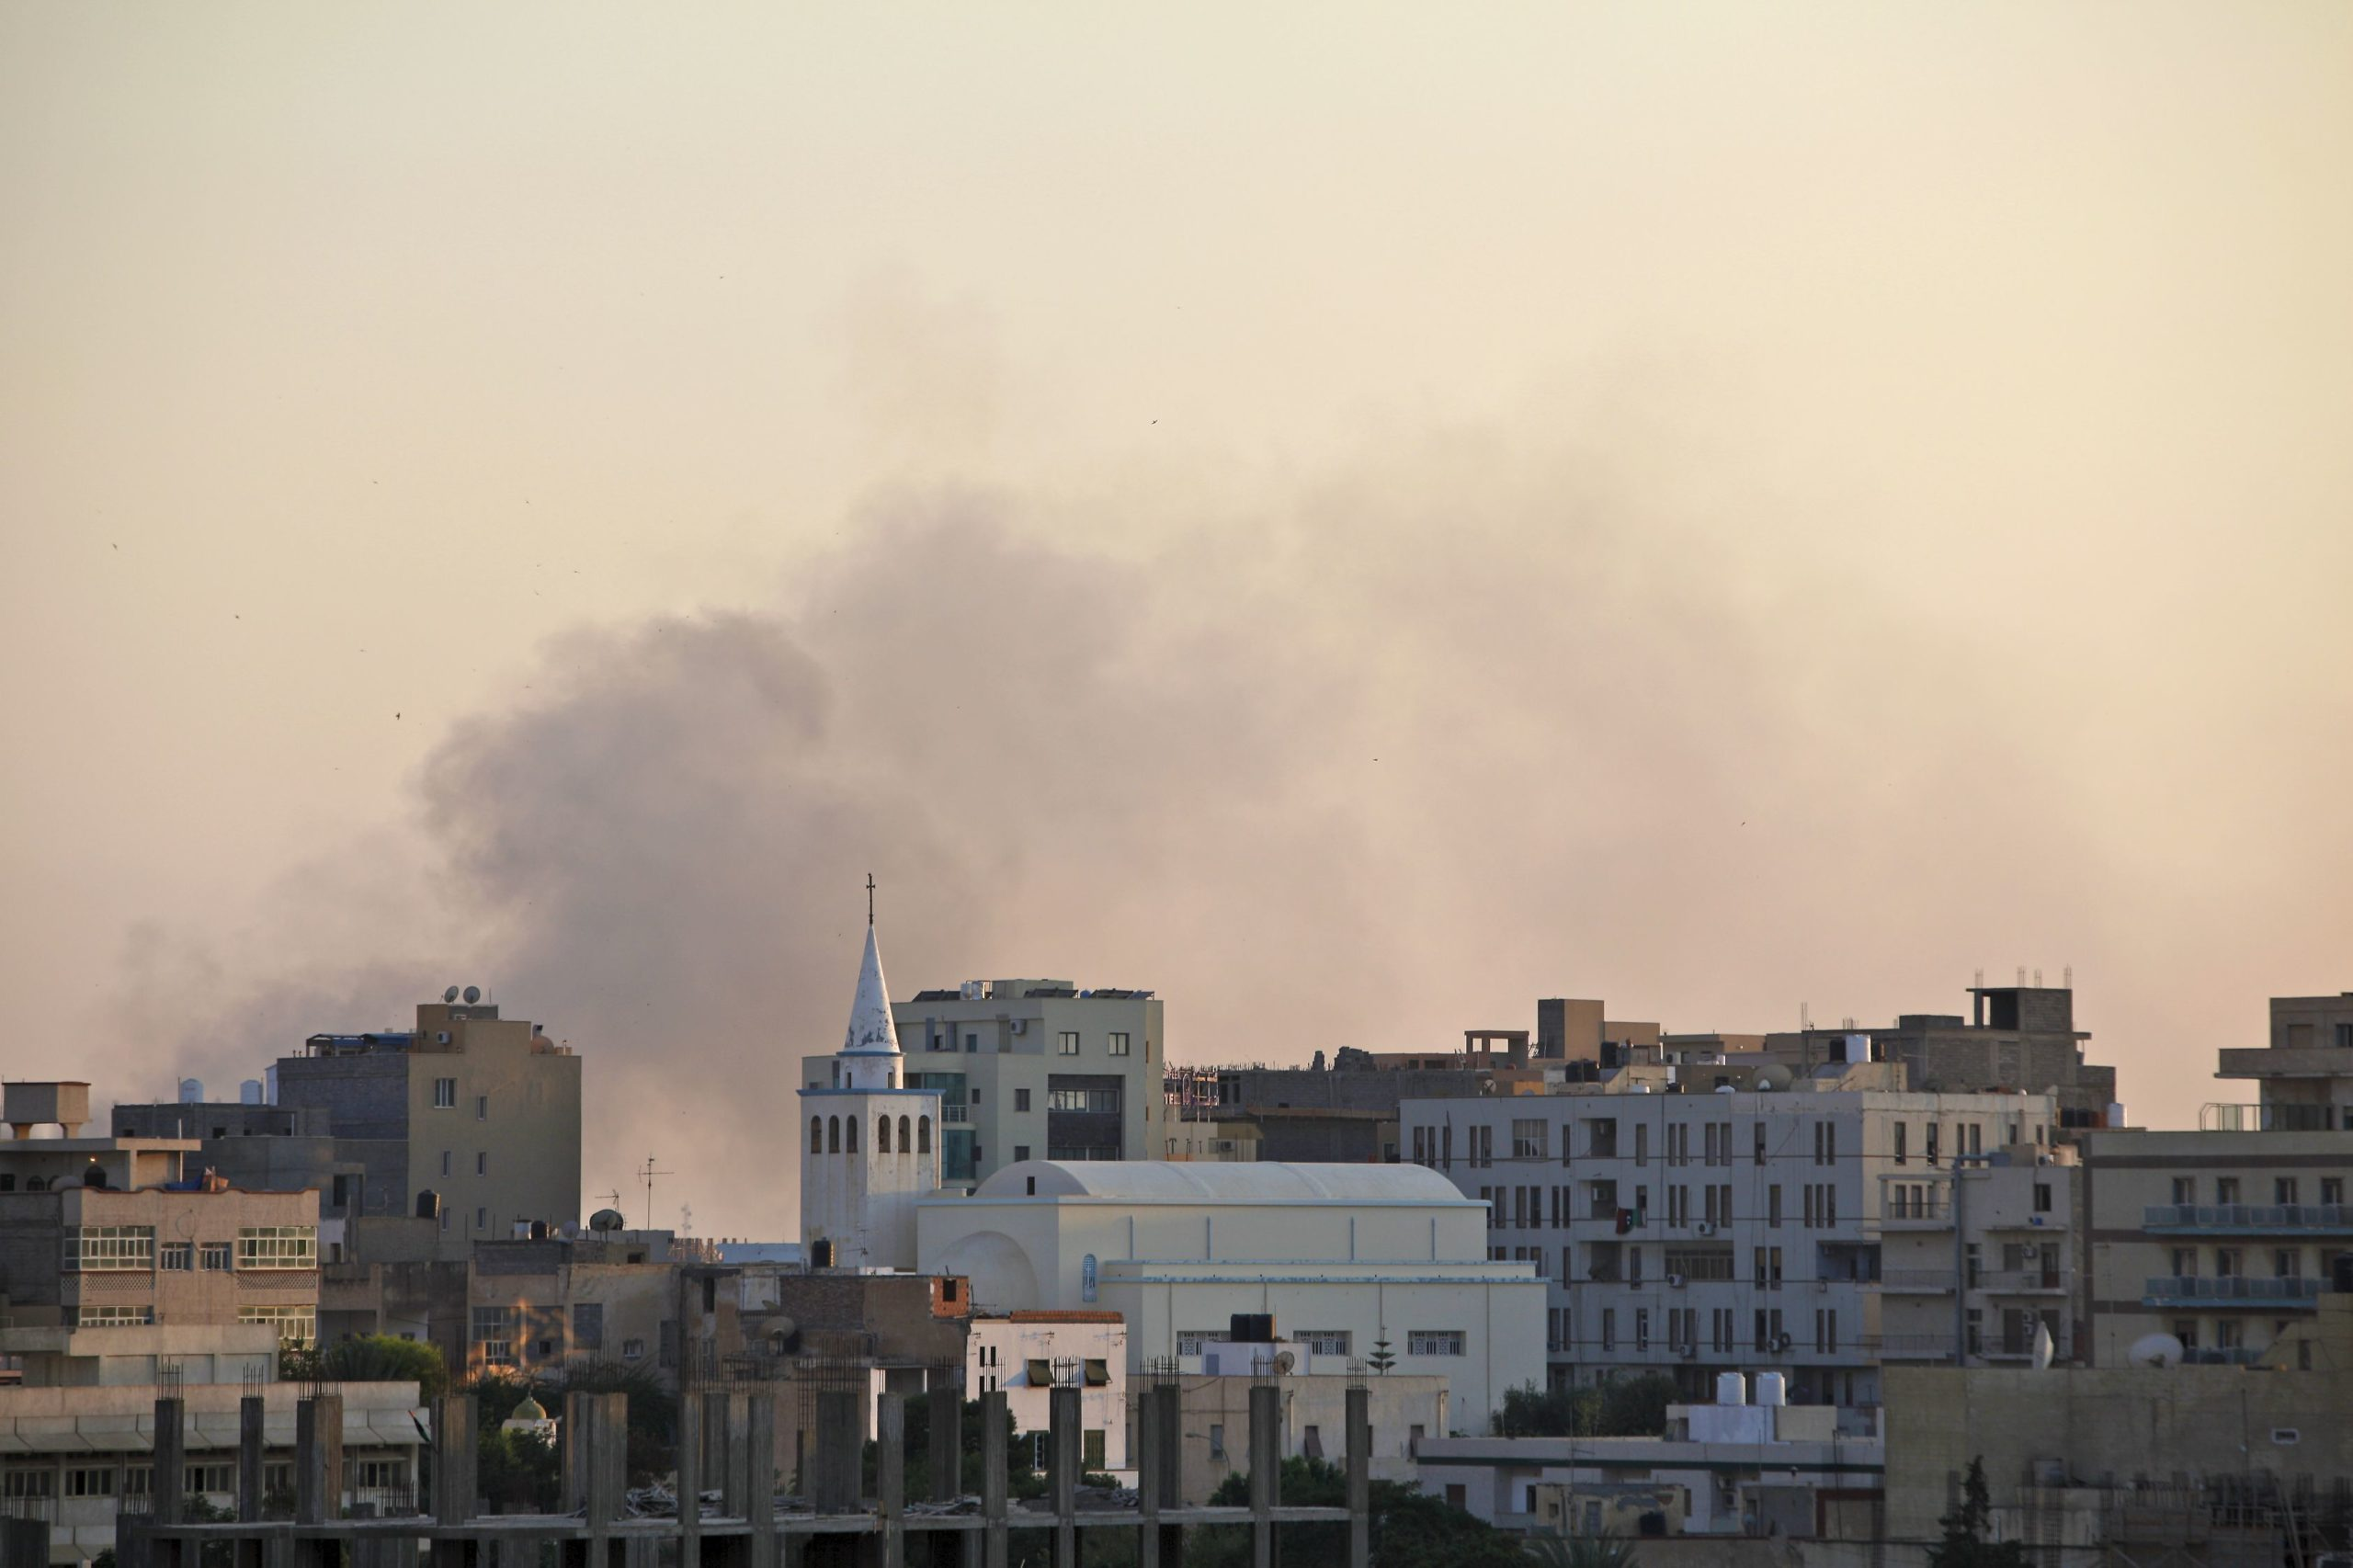 Libia - Tripoli - città vecchia